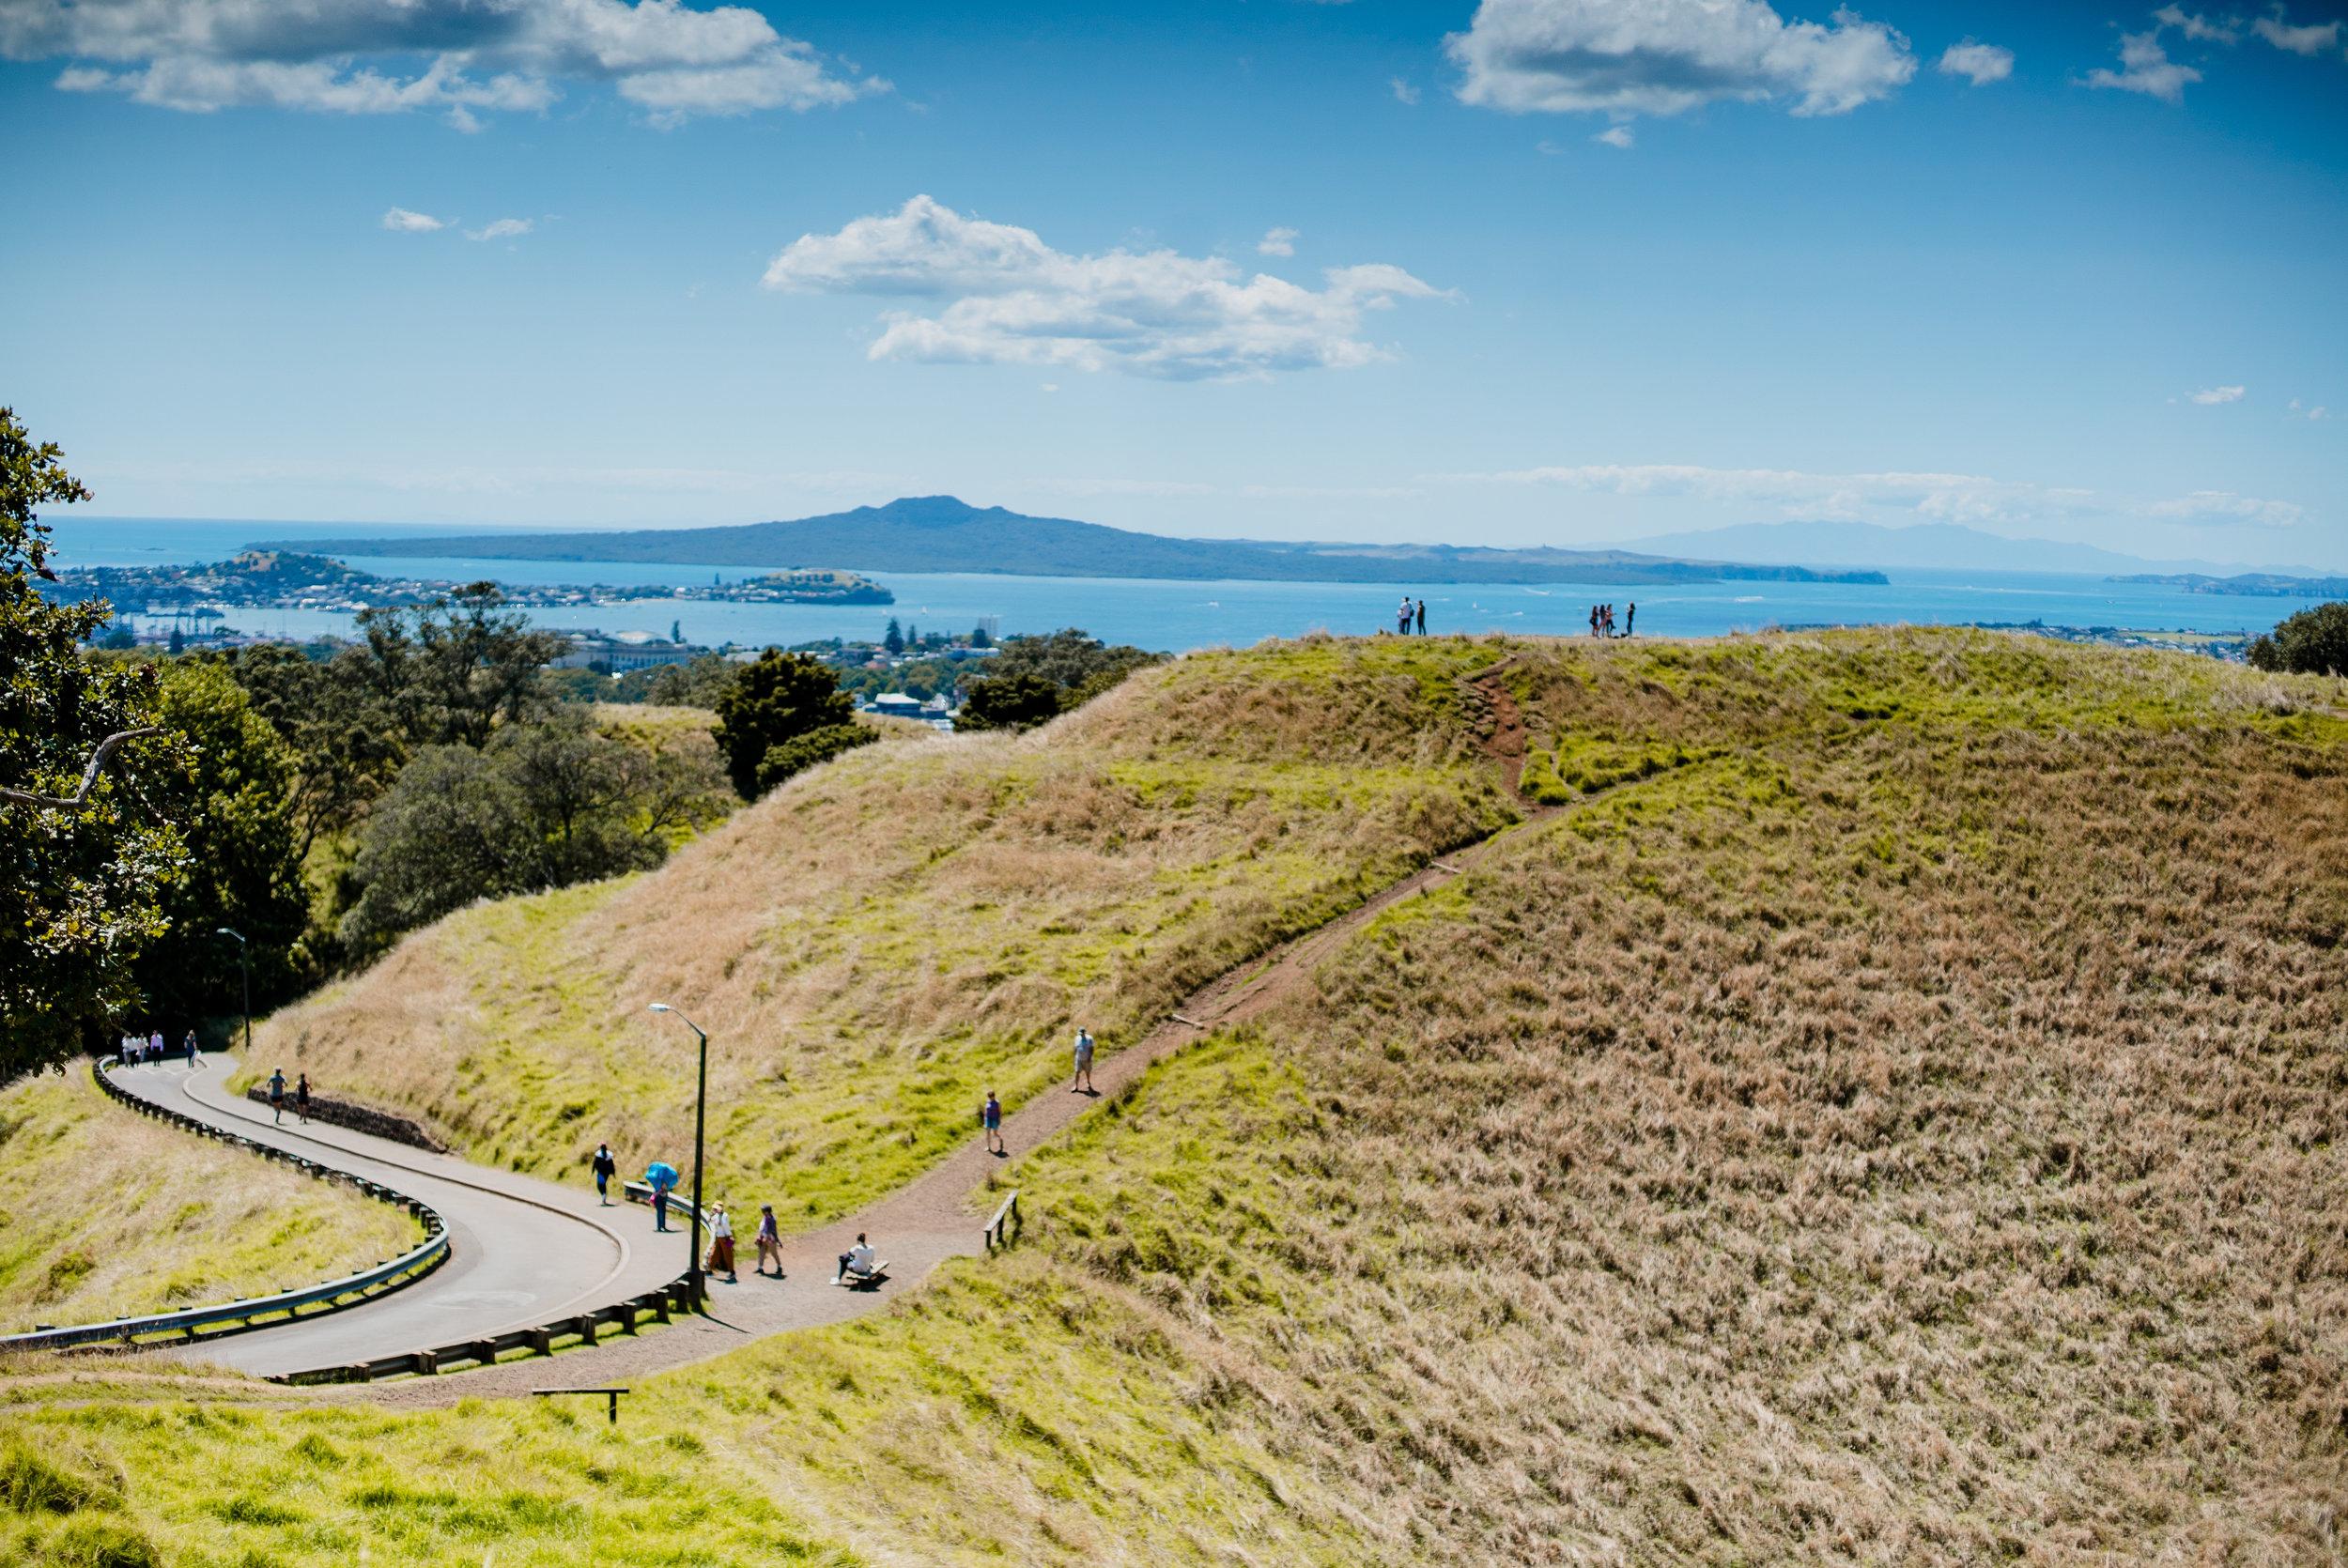 newzealand-09975.jpg